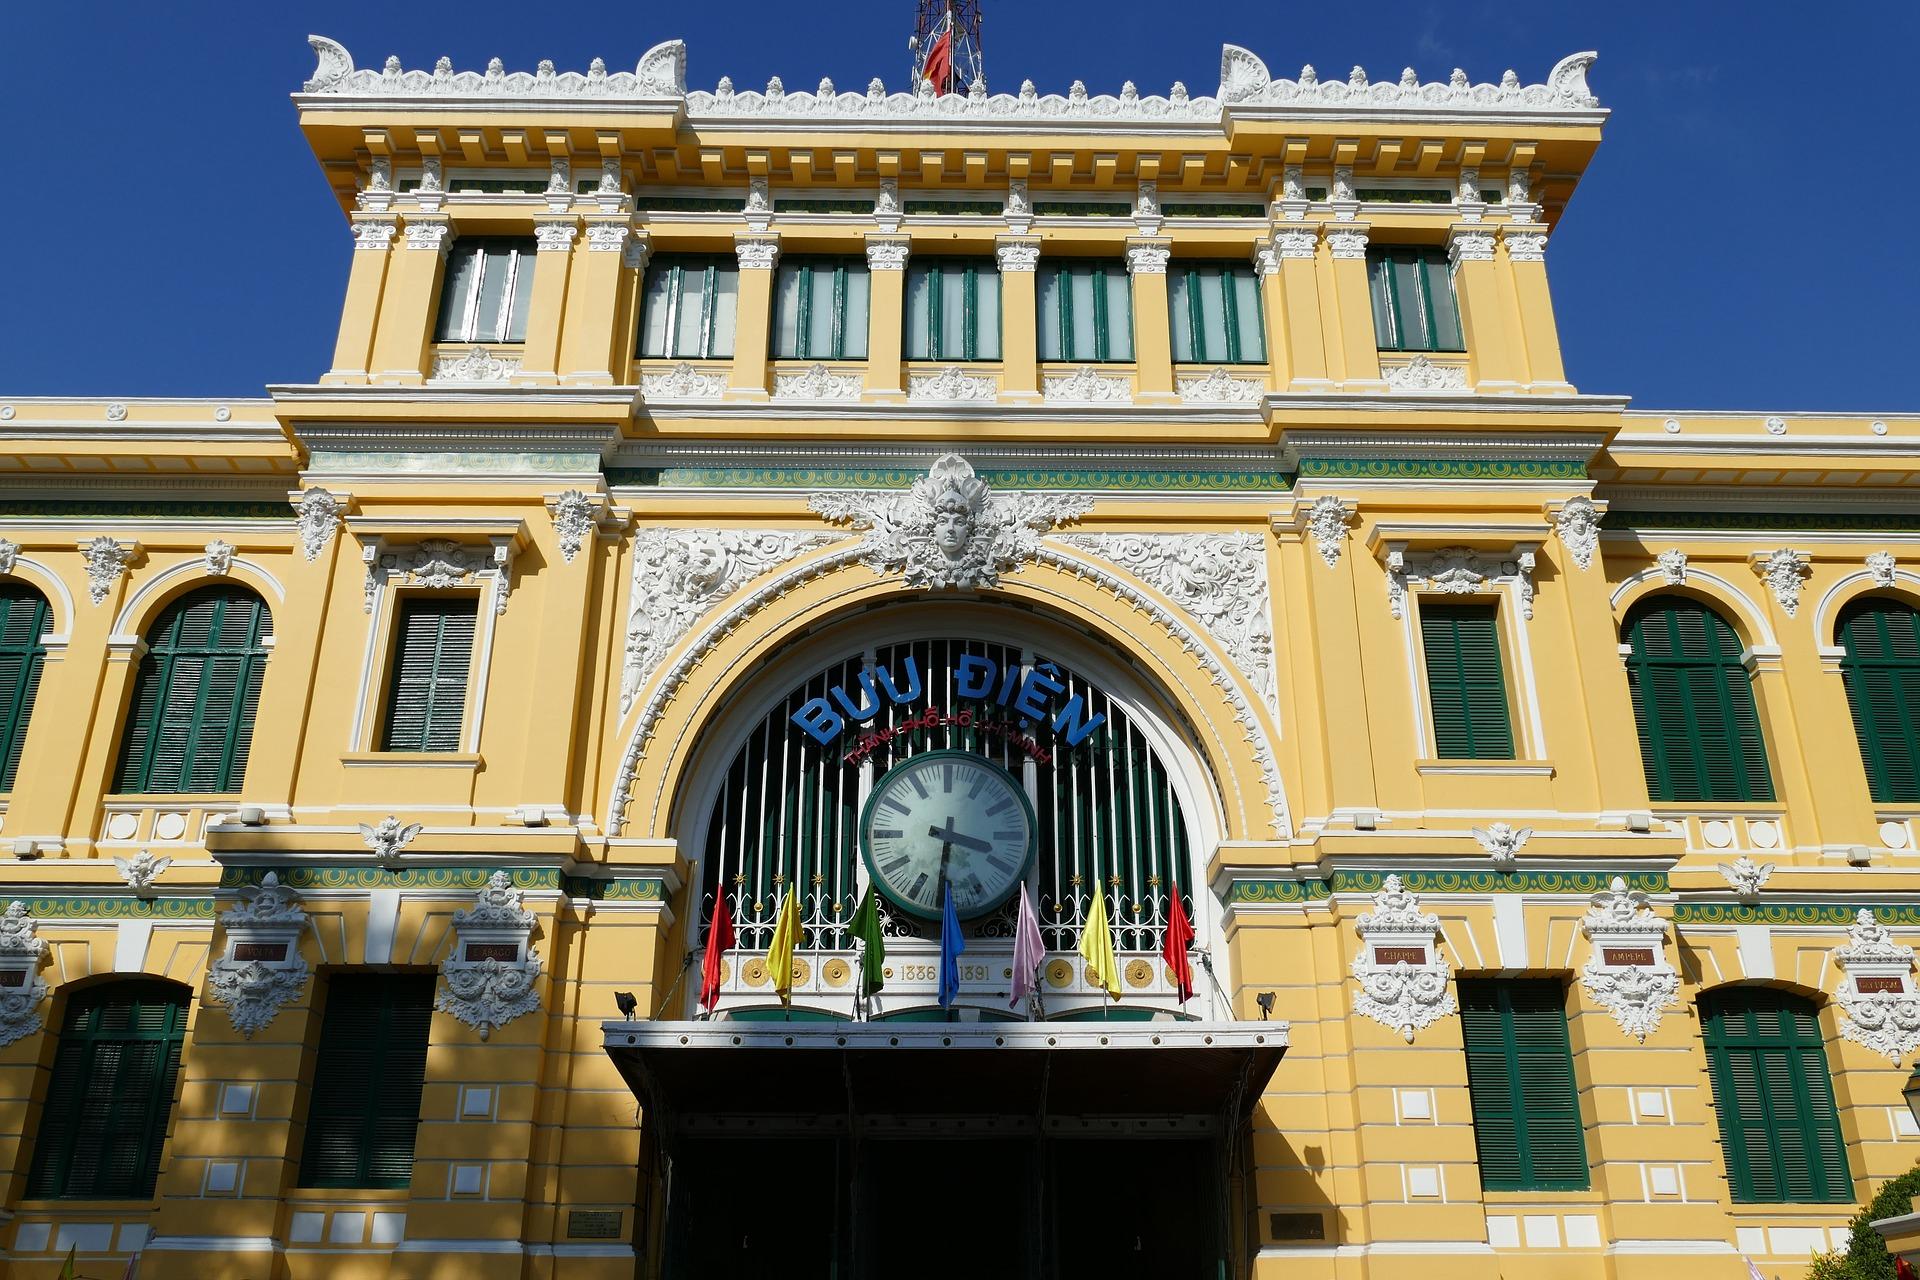 Saigon - Ho Chi Minh City - City Tour - Post Office.jpg